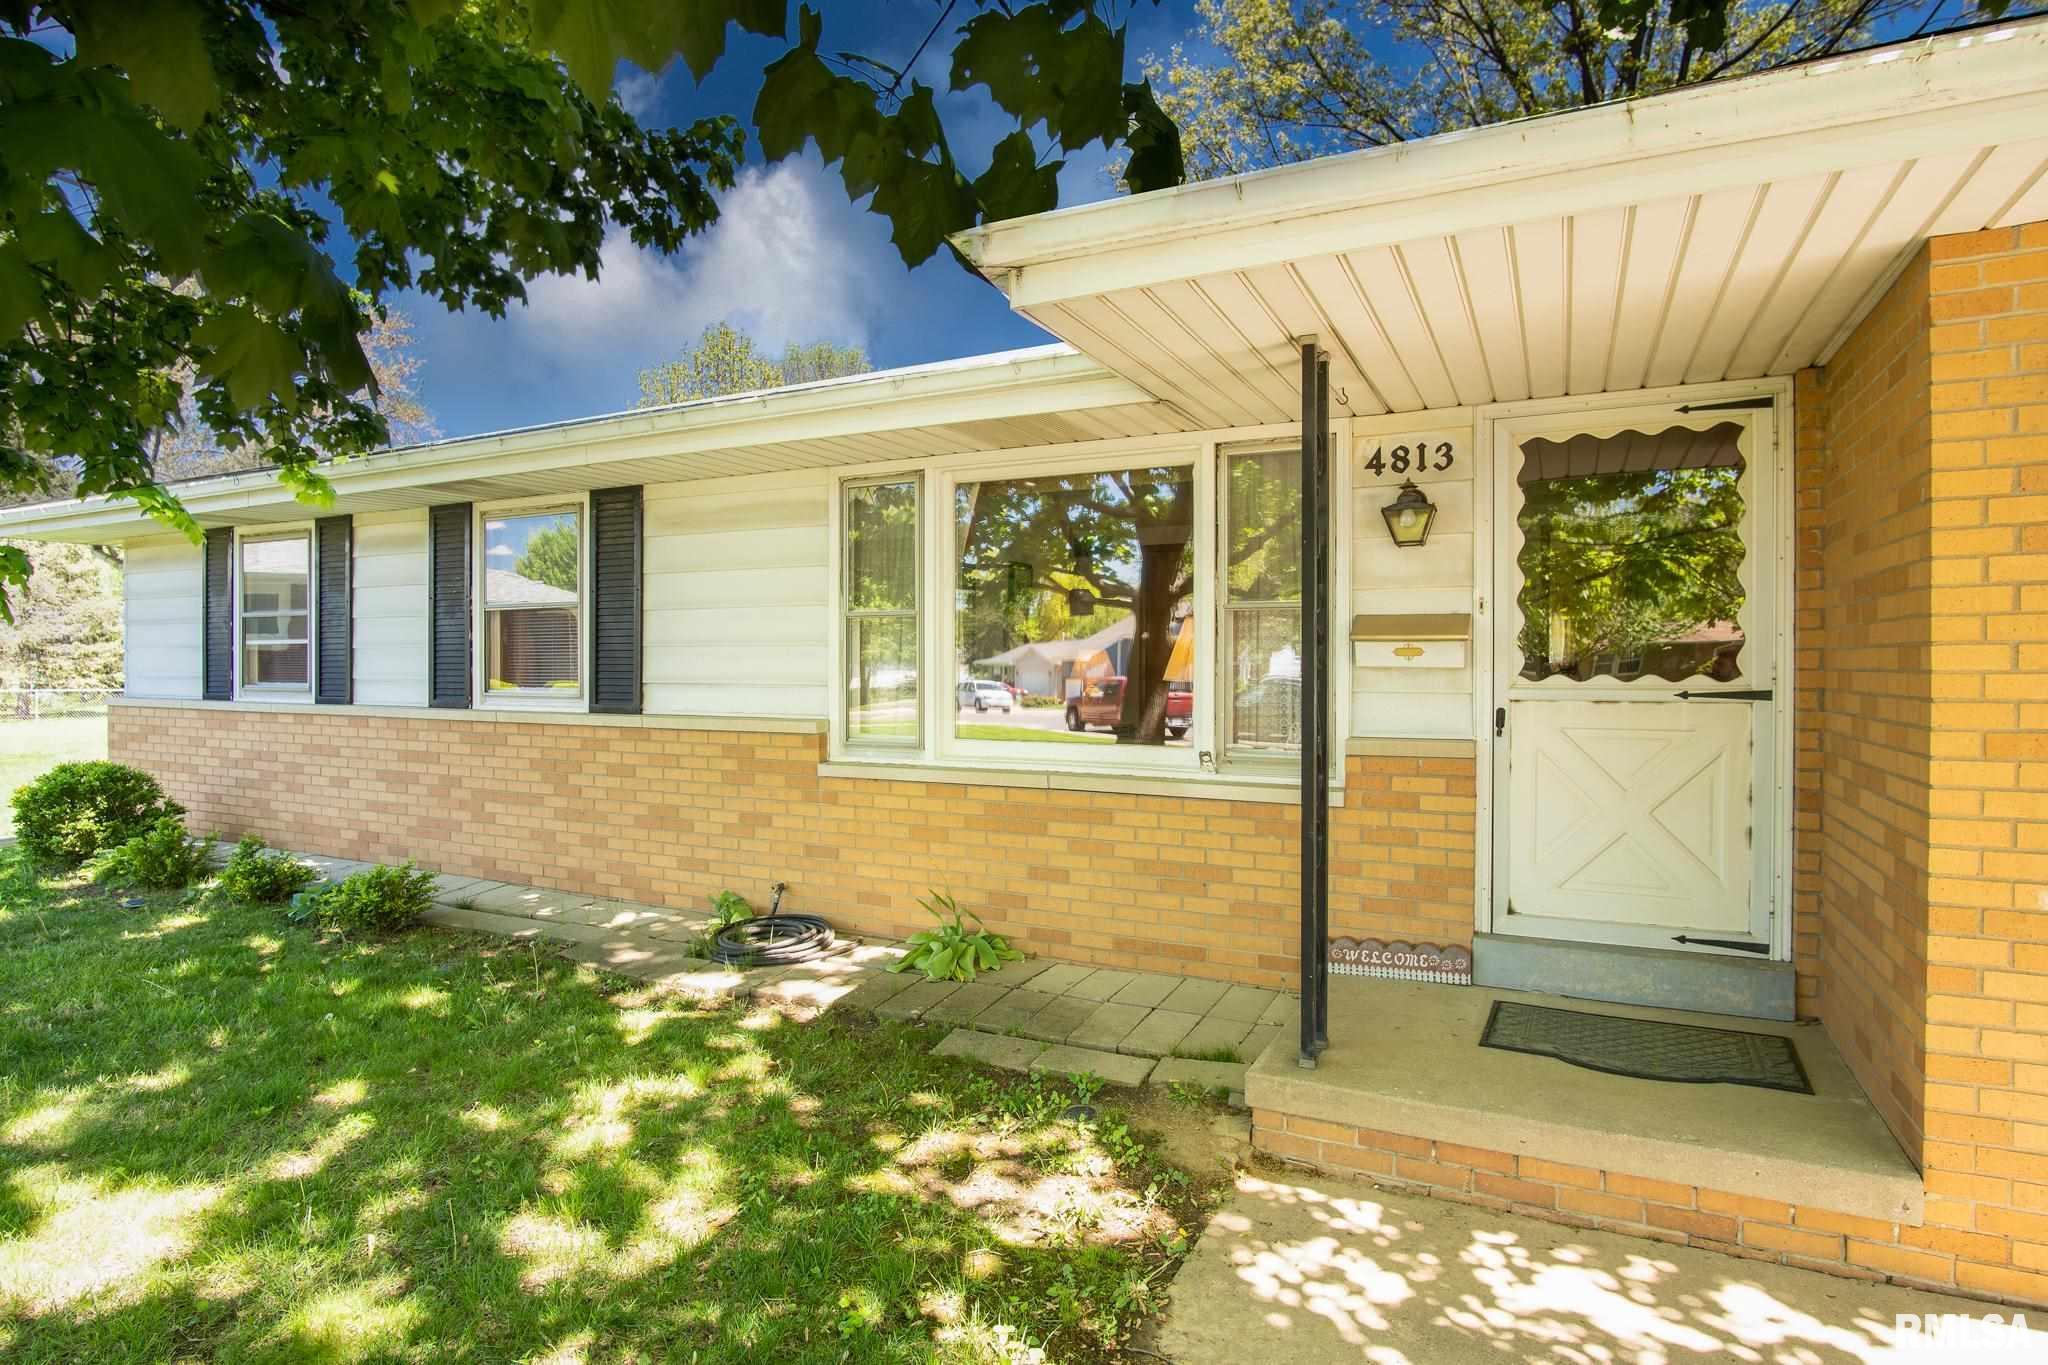 4813 W WANDA Property Photo - Bartonville, IL real estate listing